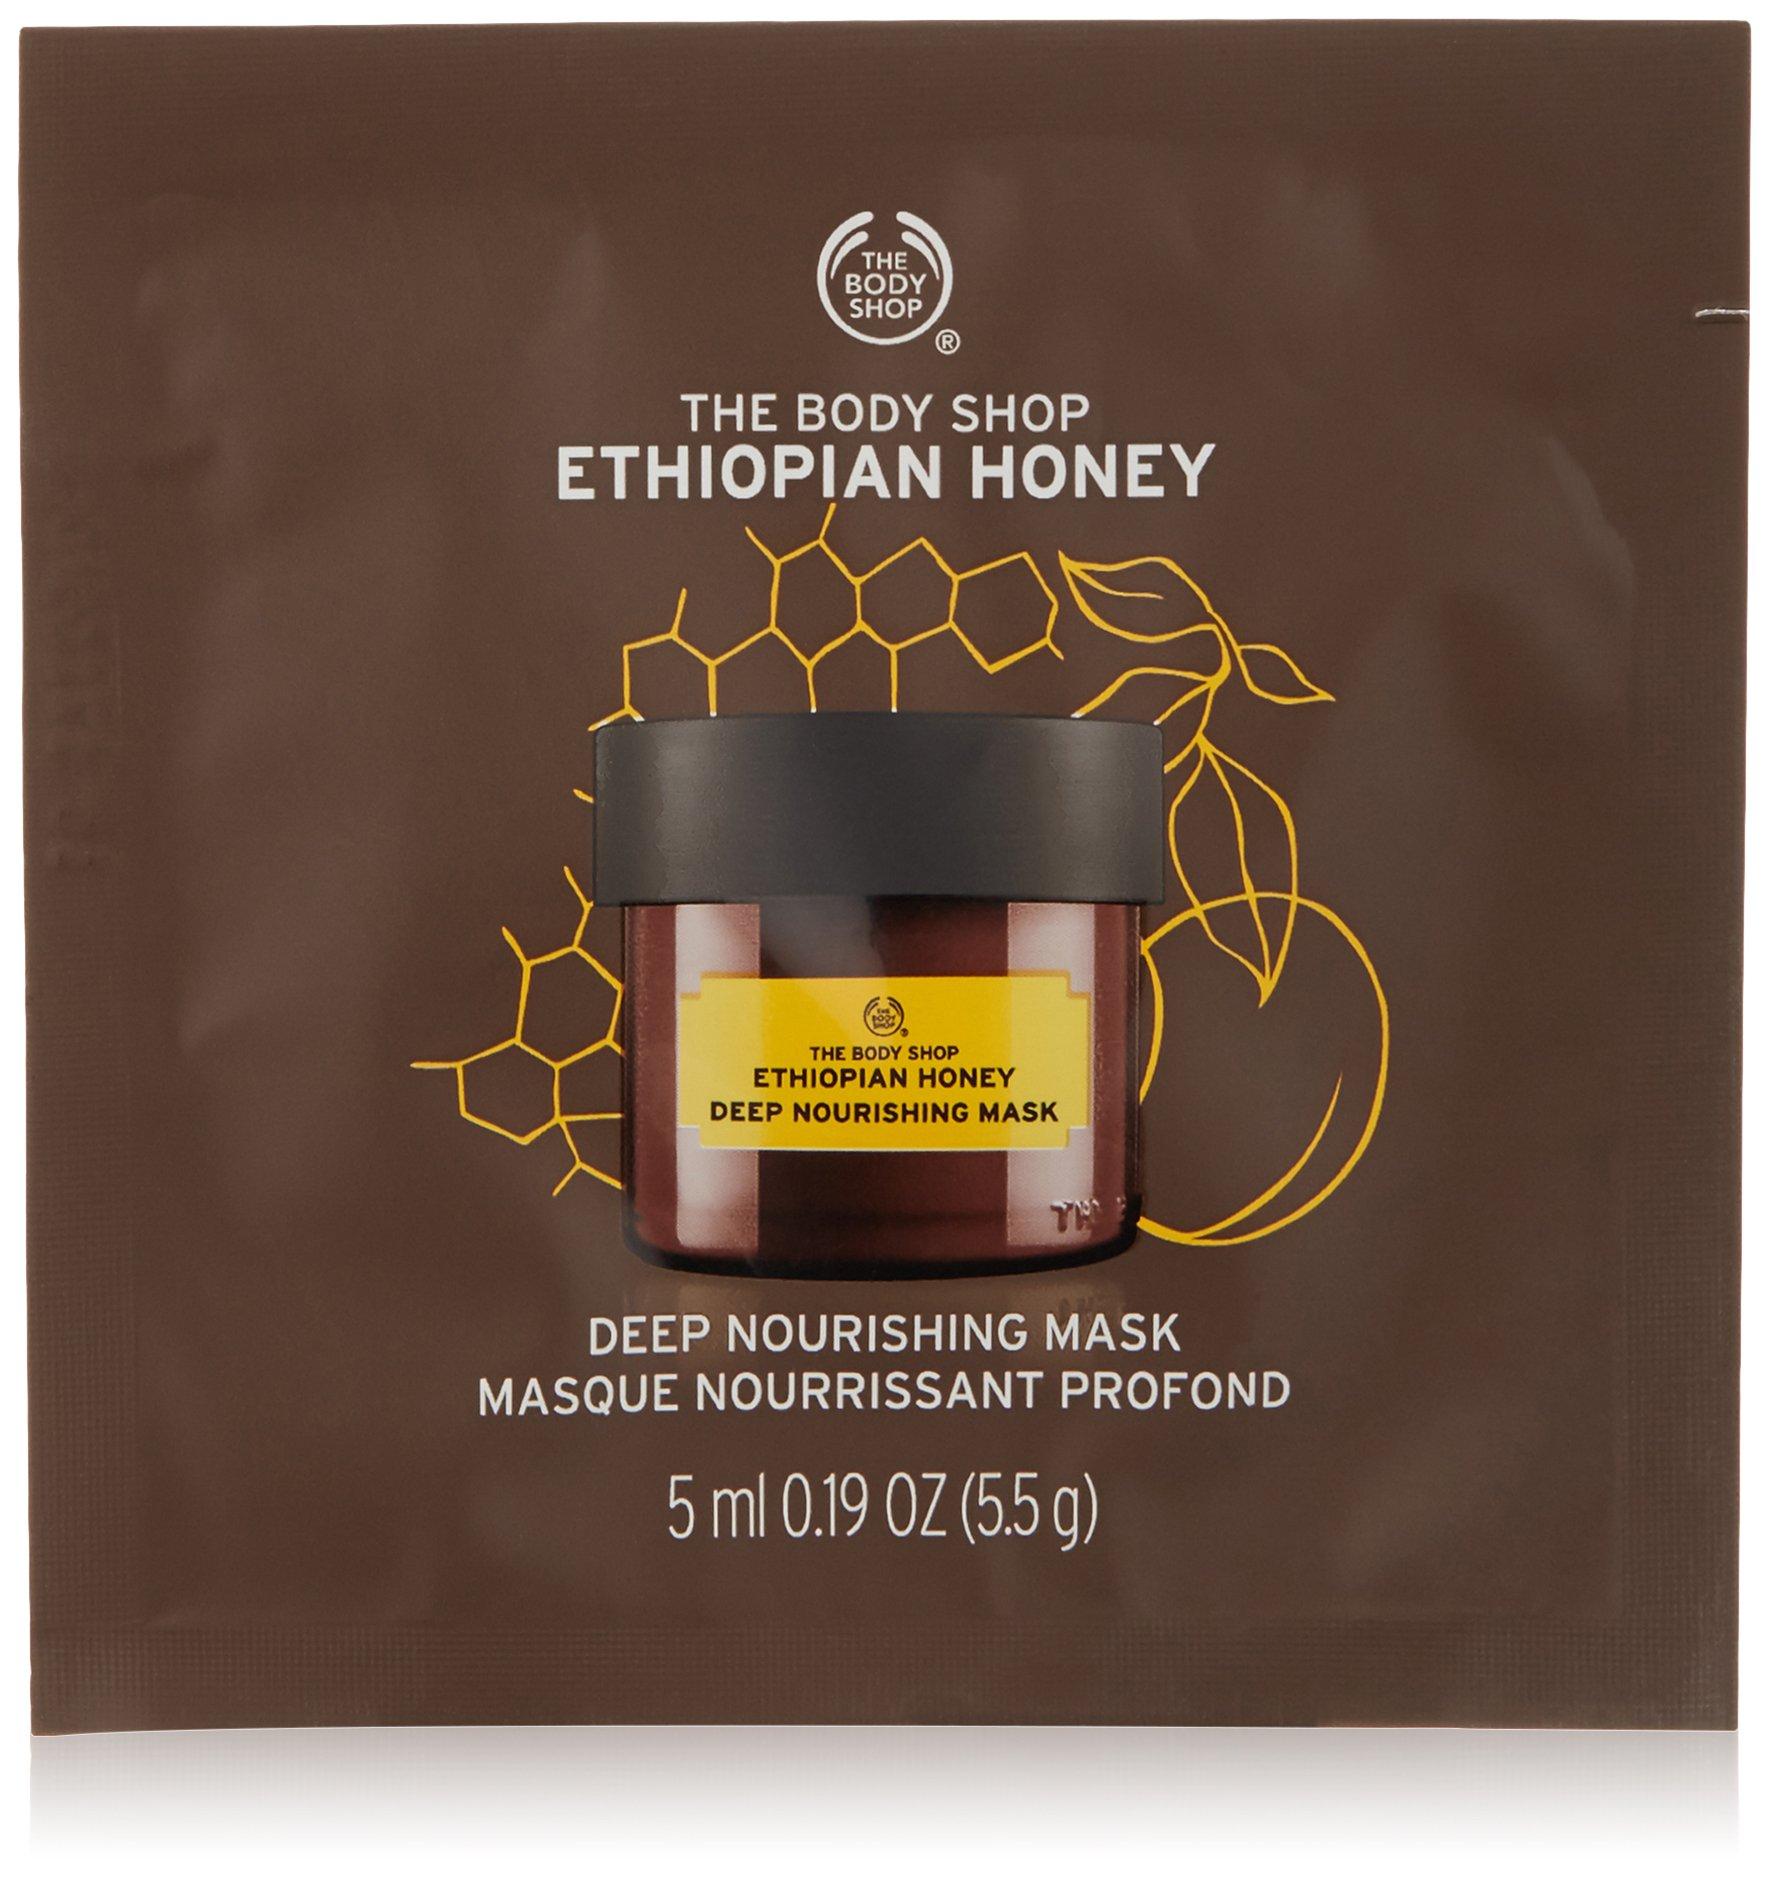 The Body Shop Ethiopian Honey Deep Nourishing Mask, Single Use Expert Facial Mask, Paraben Free, 0.2 Oz.